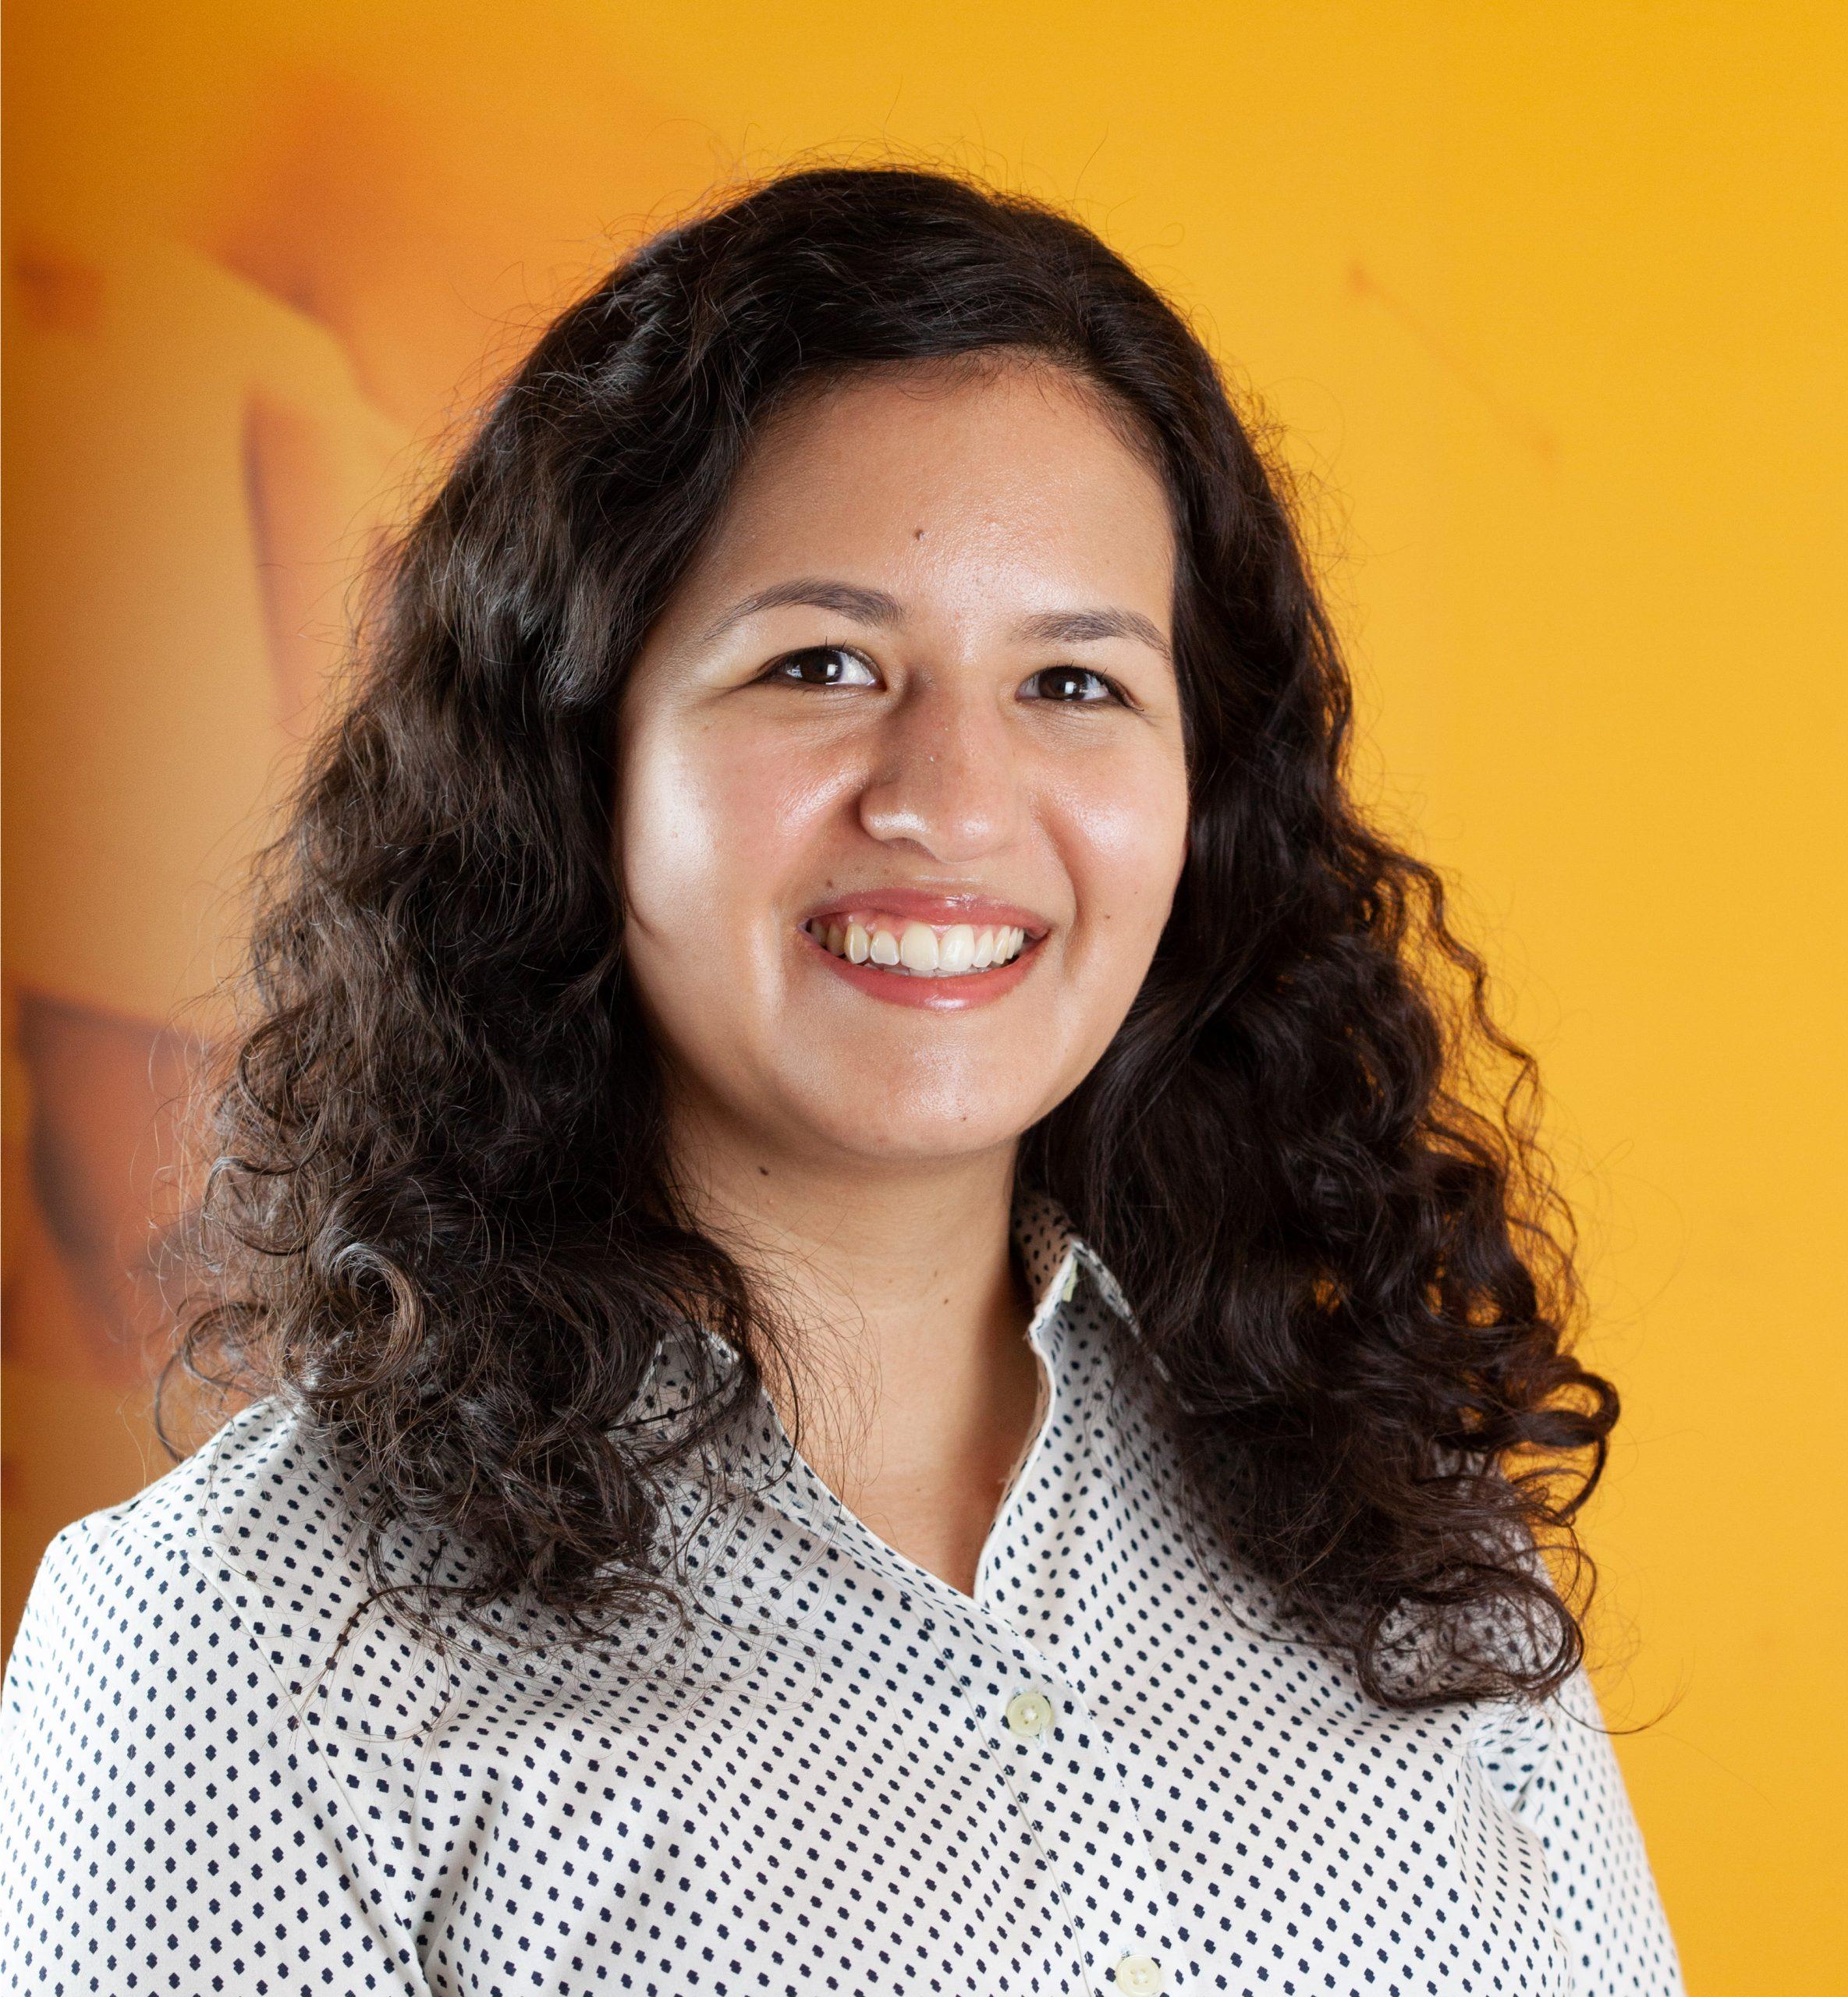 Daniela Rondinone profile image